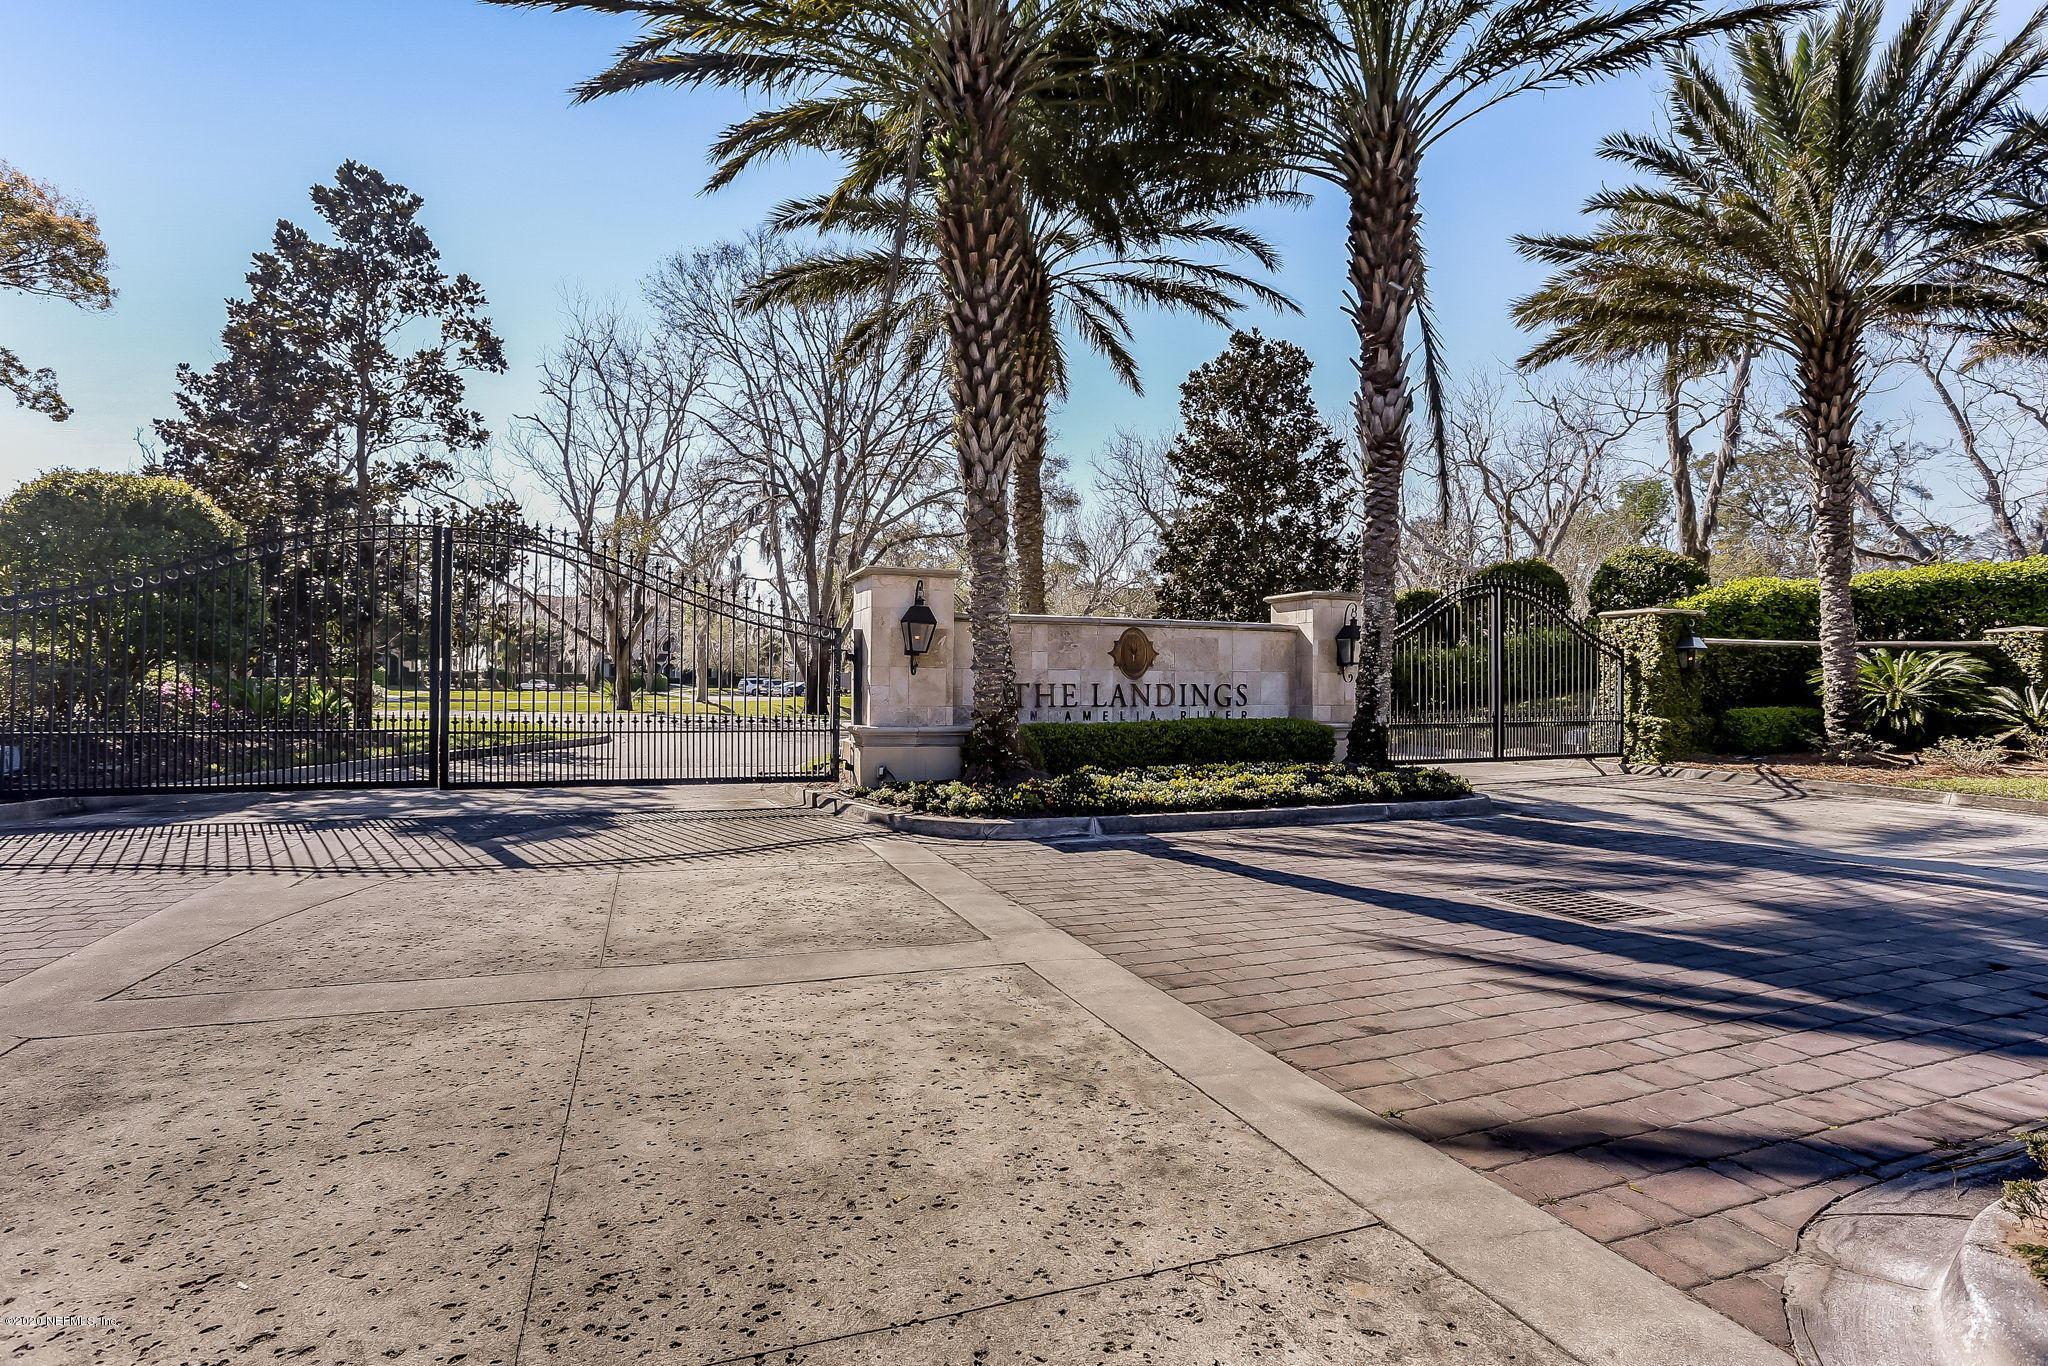 5063 FIRST COAST, FERNANDINA BEACH, FLORIDA 32034, 3 Bedrooms Bedrooms, ,3 BathroomsBathrooms,Residential,For sale,FIRST COAST,1083086